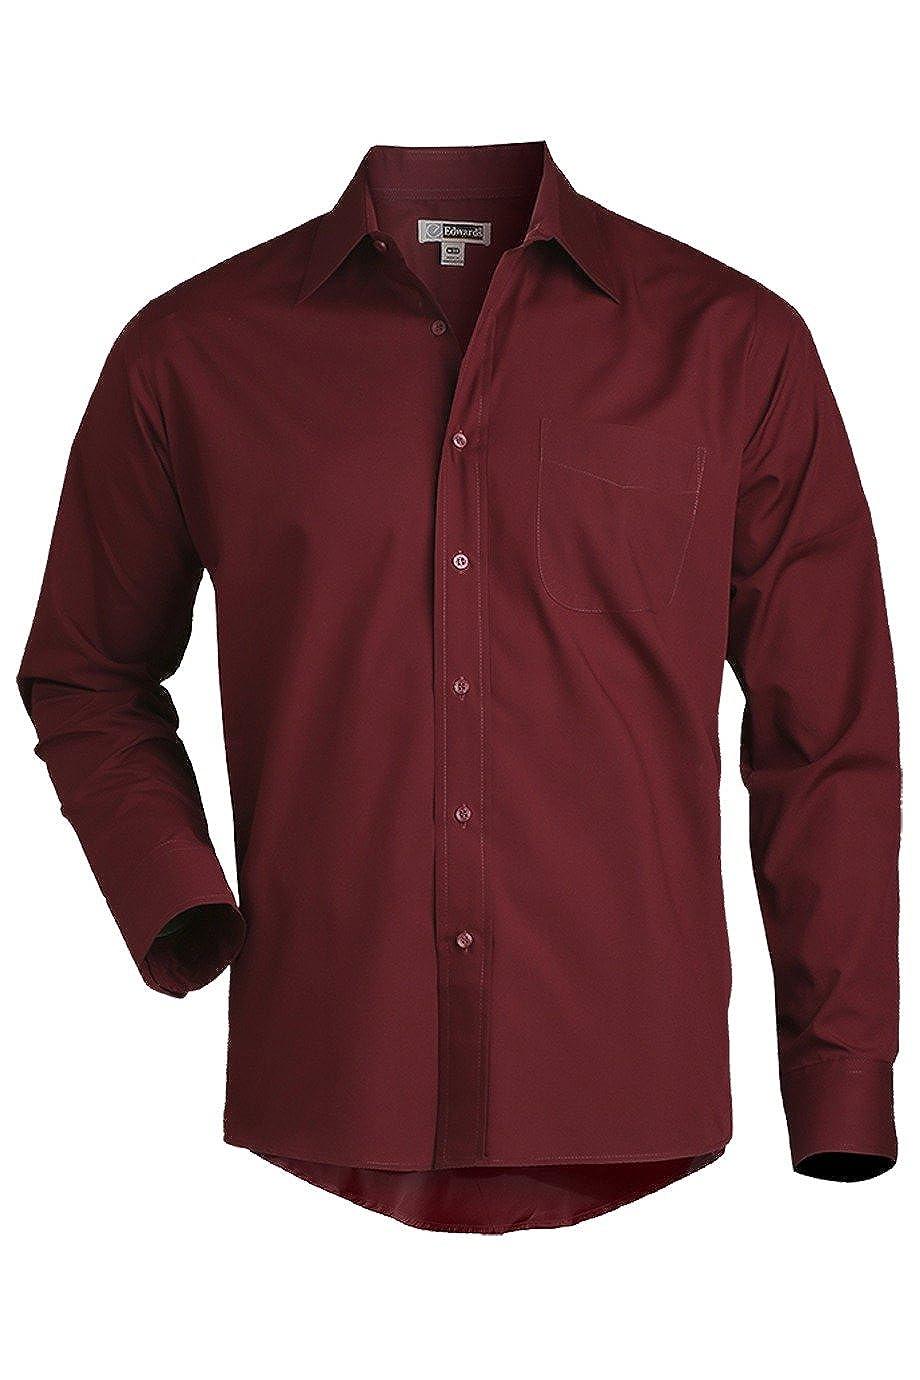 Edwards Mens Long Sleeve Value Broadcloth Shirt